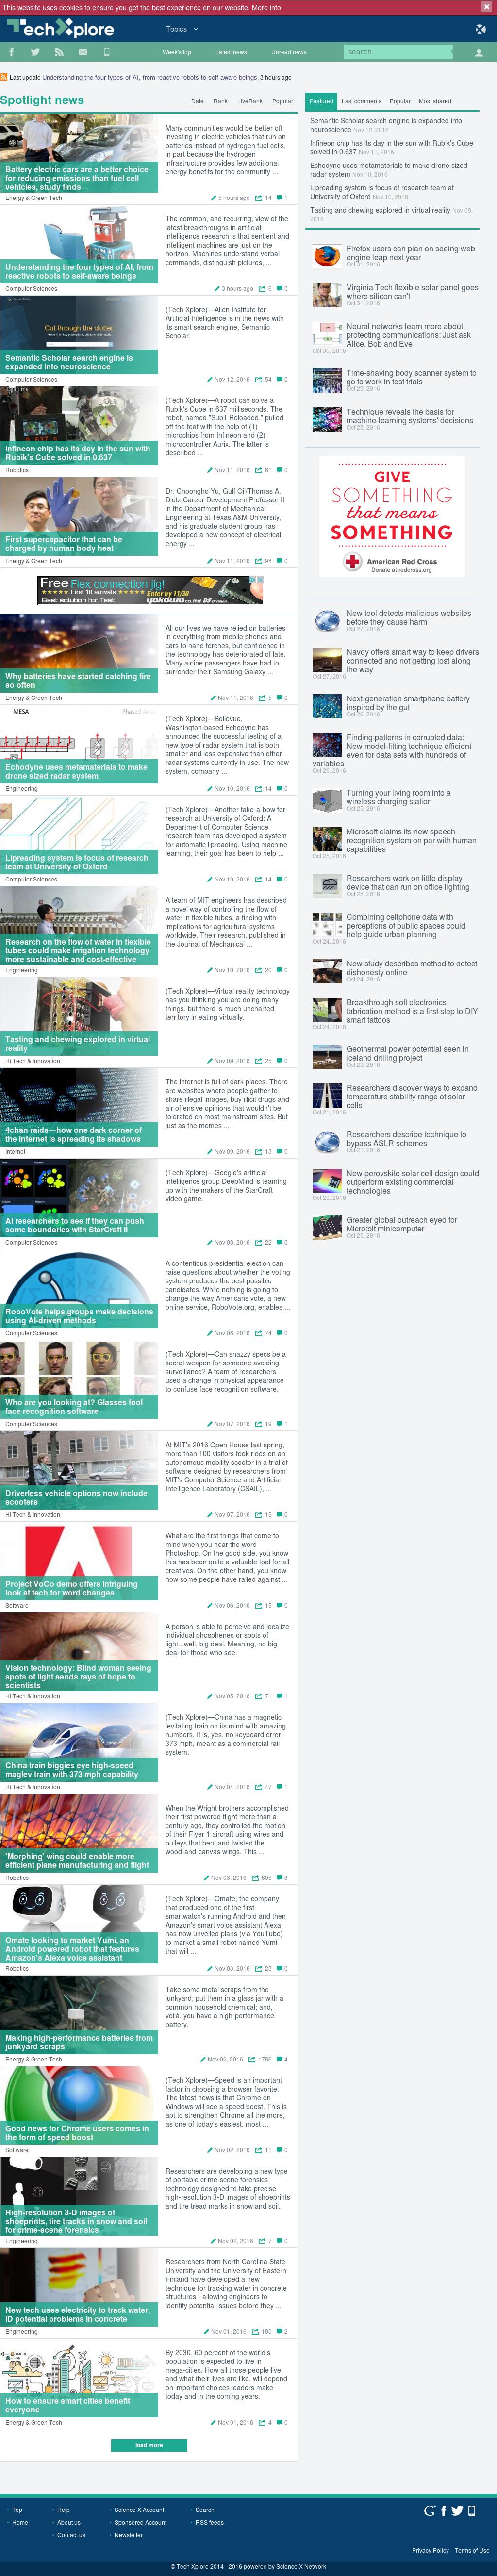 Tech Xplore Competitors, Revenue and Employees - Owler Company Profile